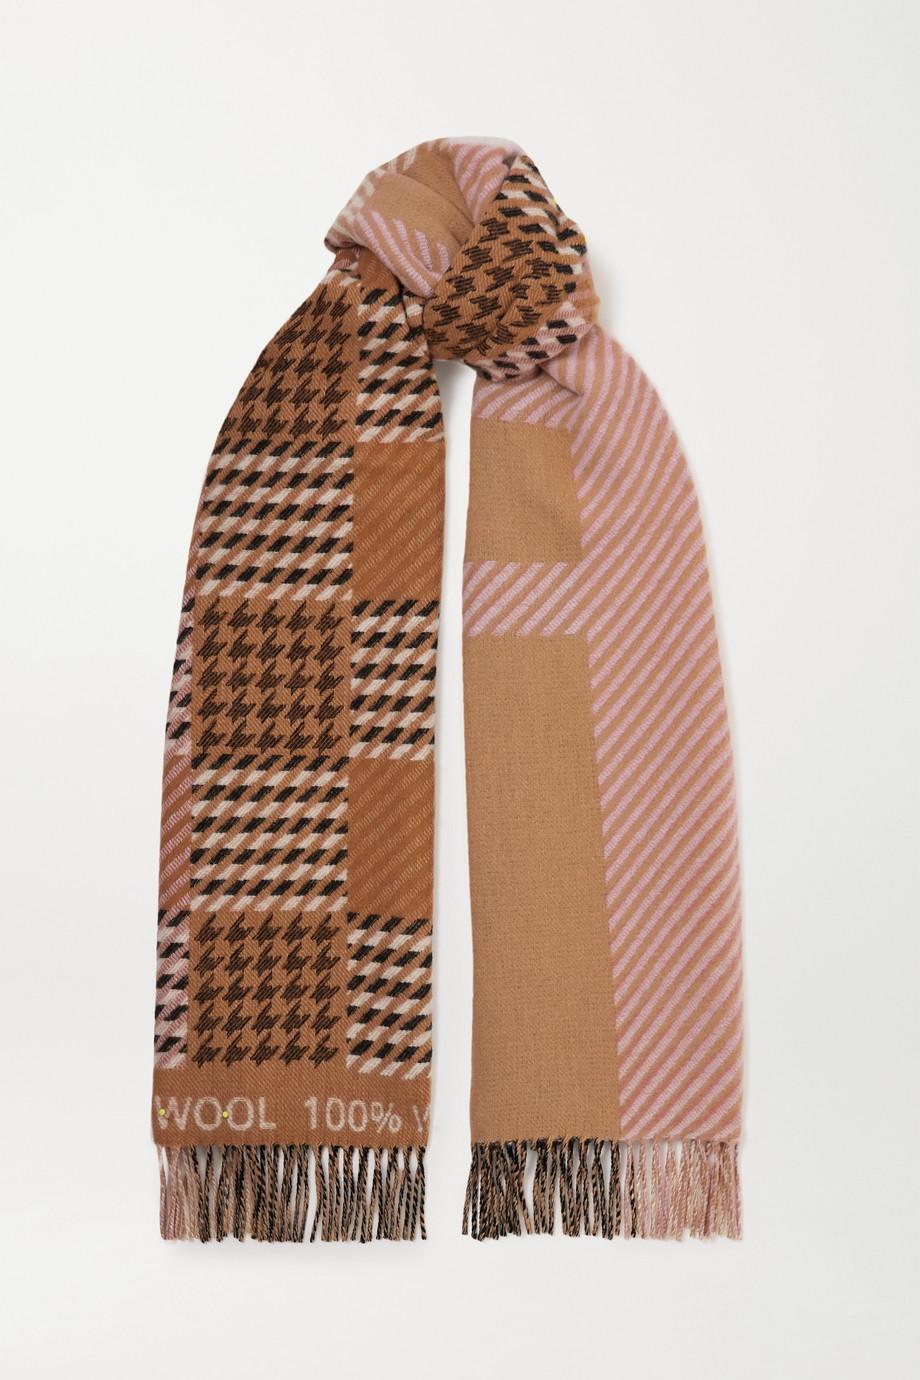 Johnstons of Elgin + Mother of Pearl Elgin wool-jacquard scarf